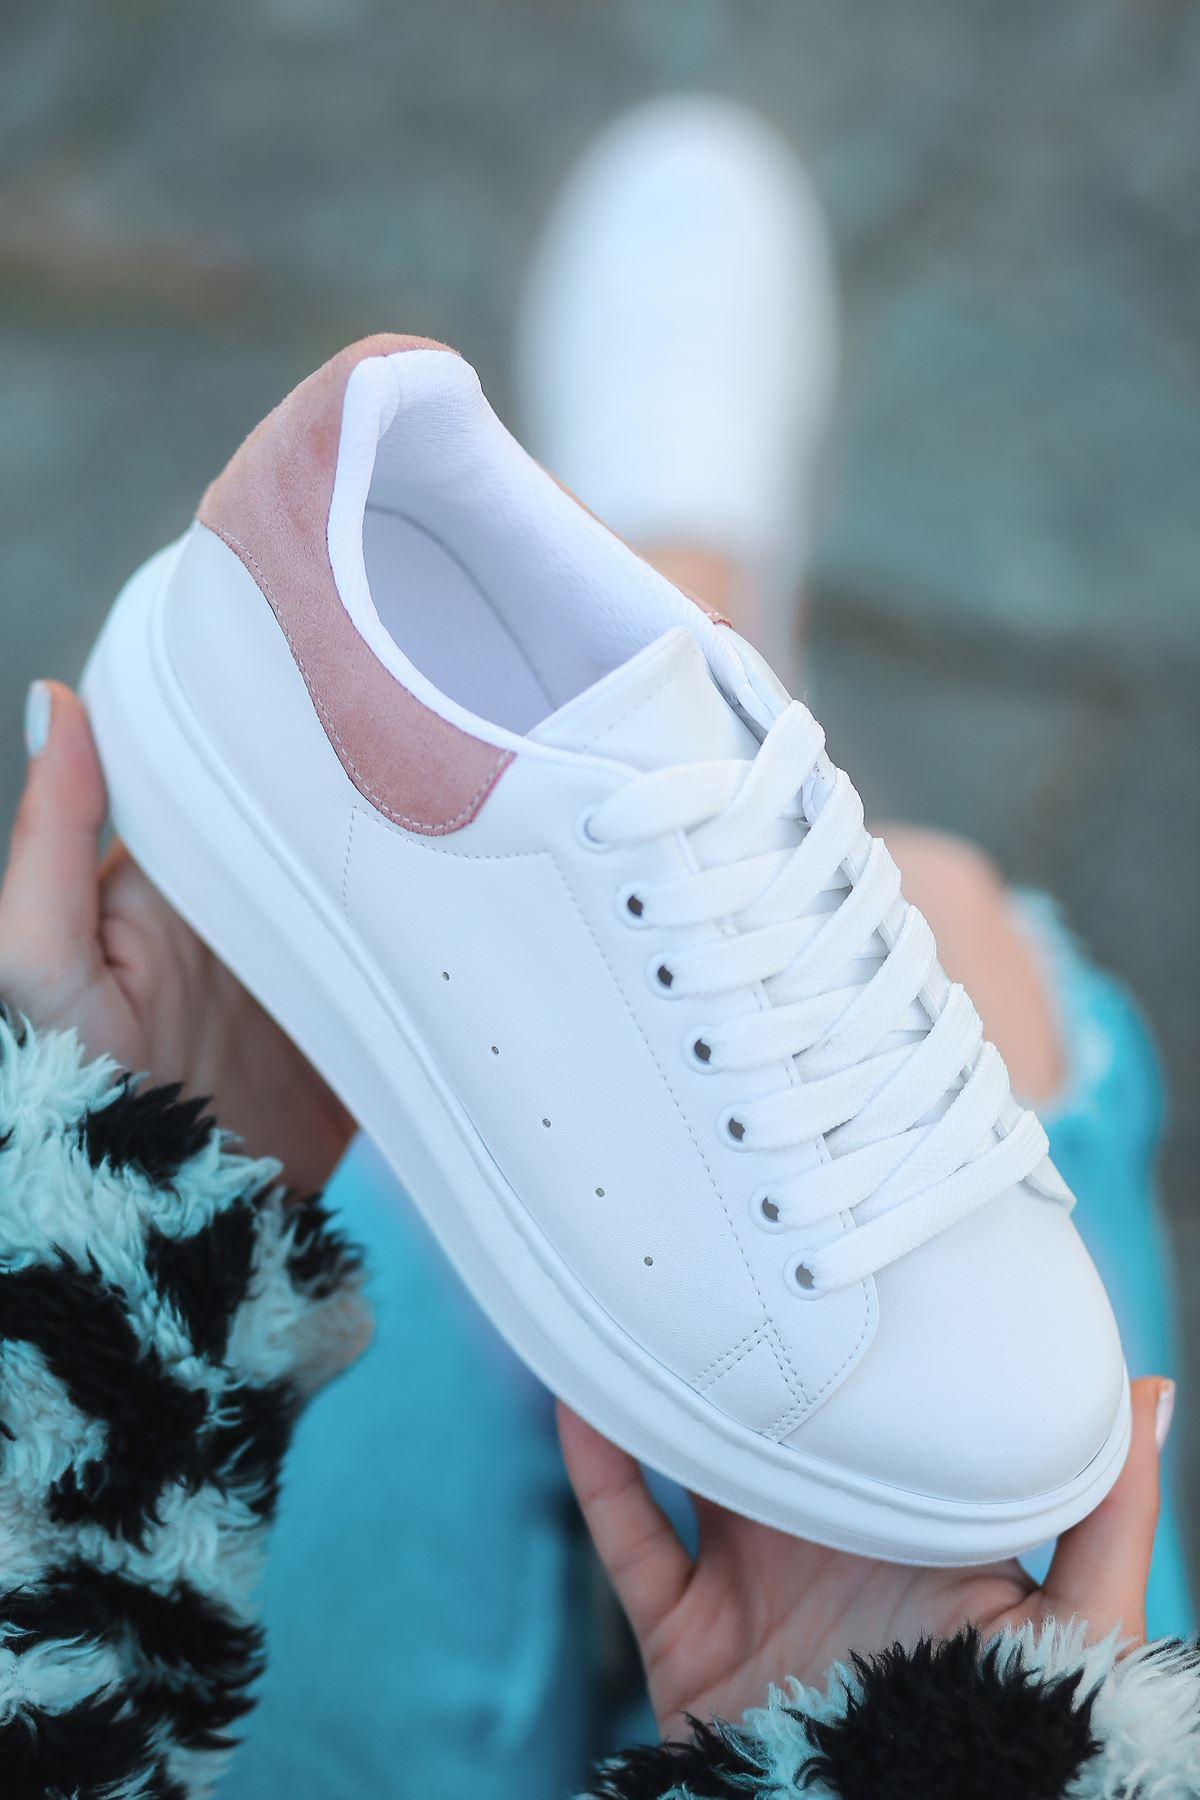 Lucy Mat Deri Pudra Süet Detay Sneakers Beyaz